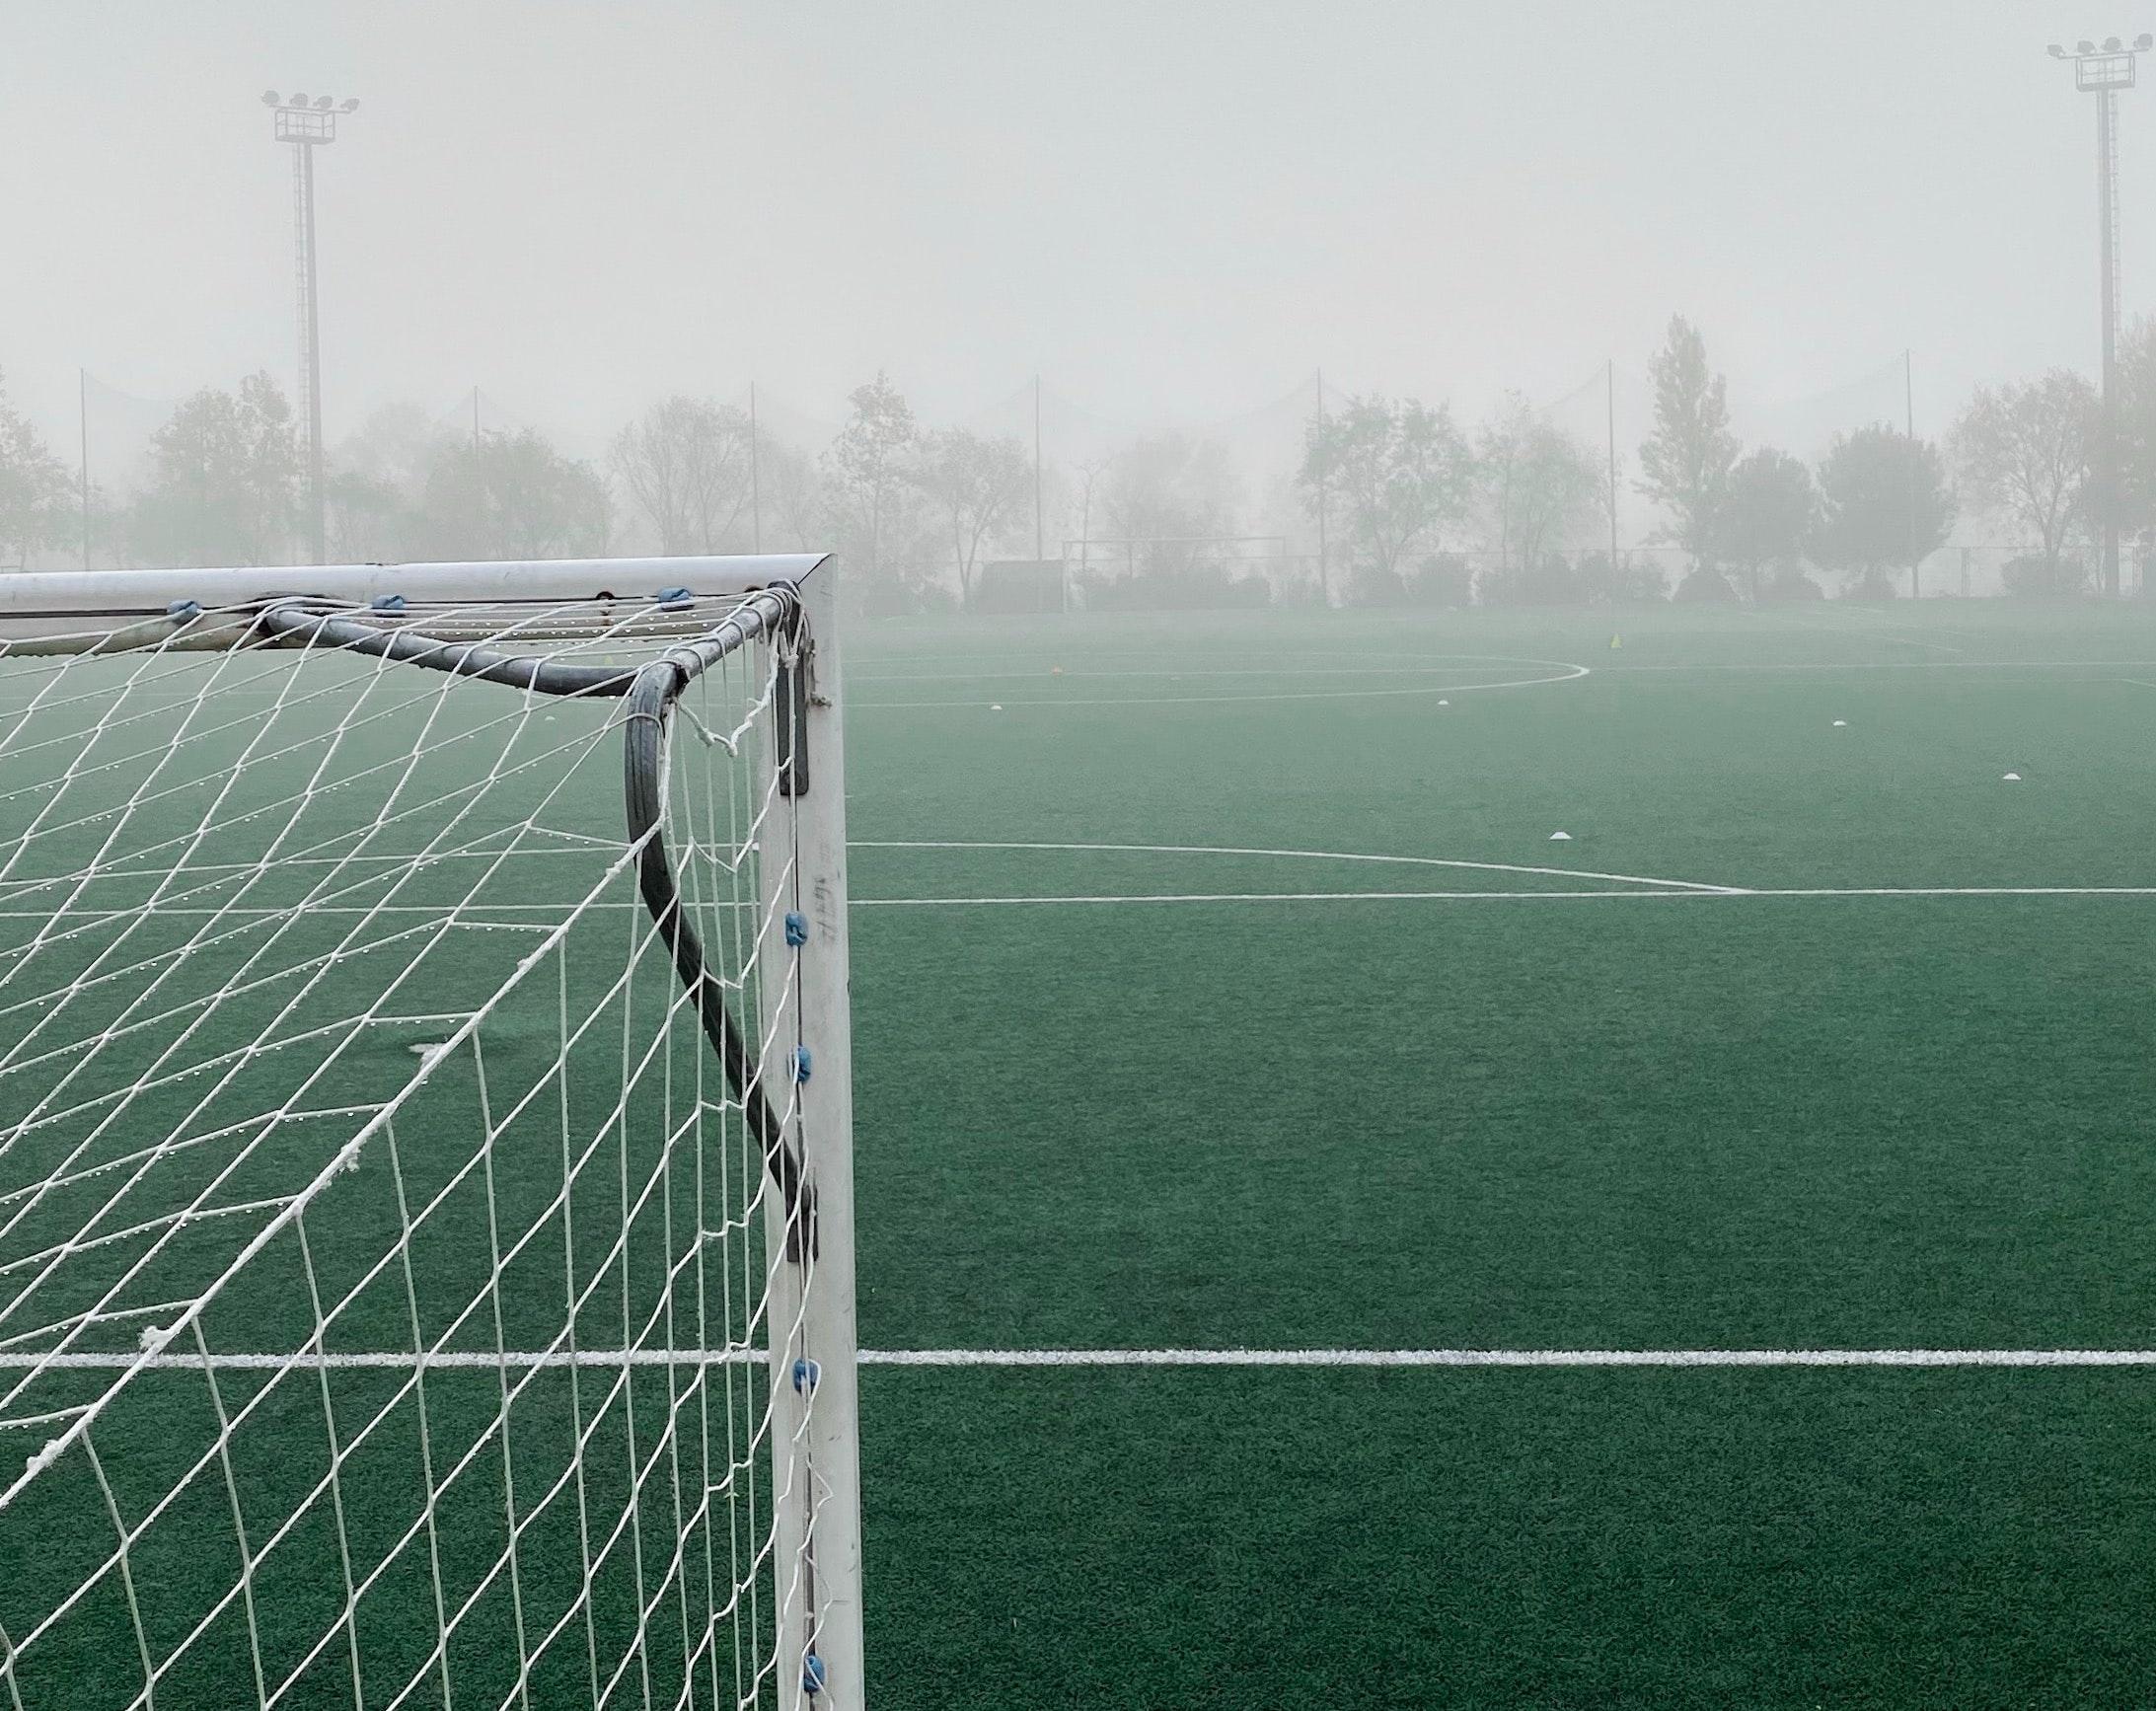 ködös focipálya